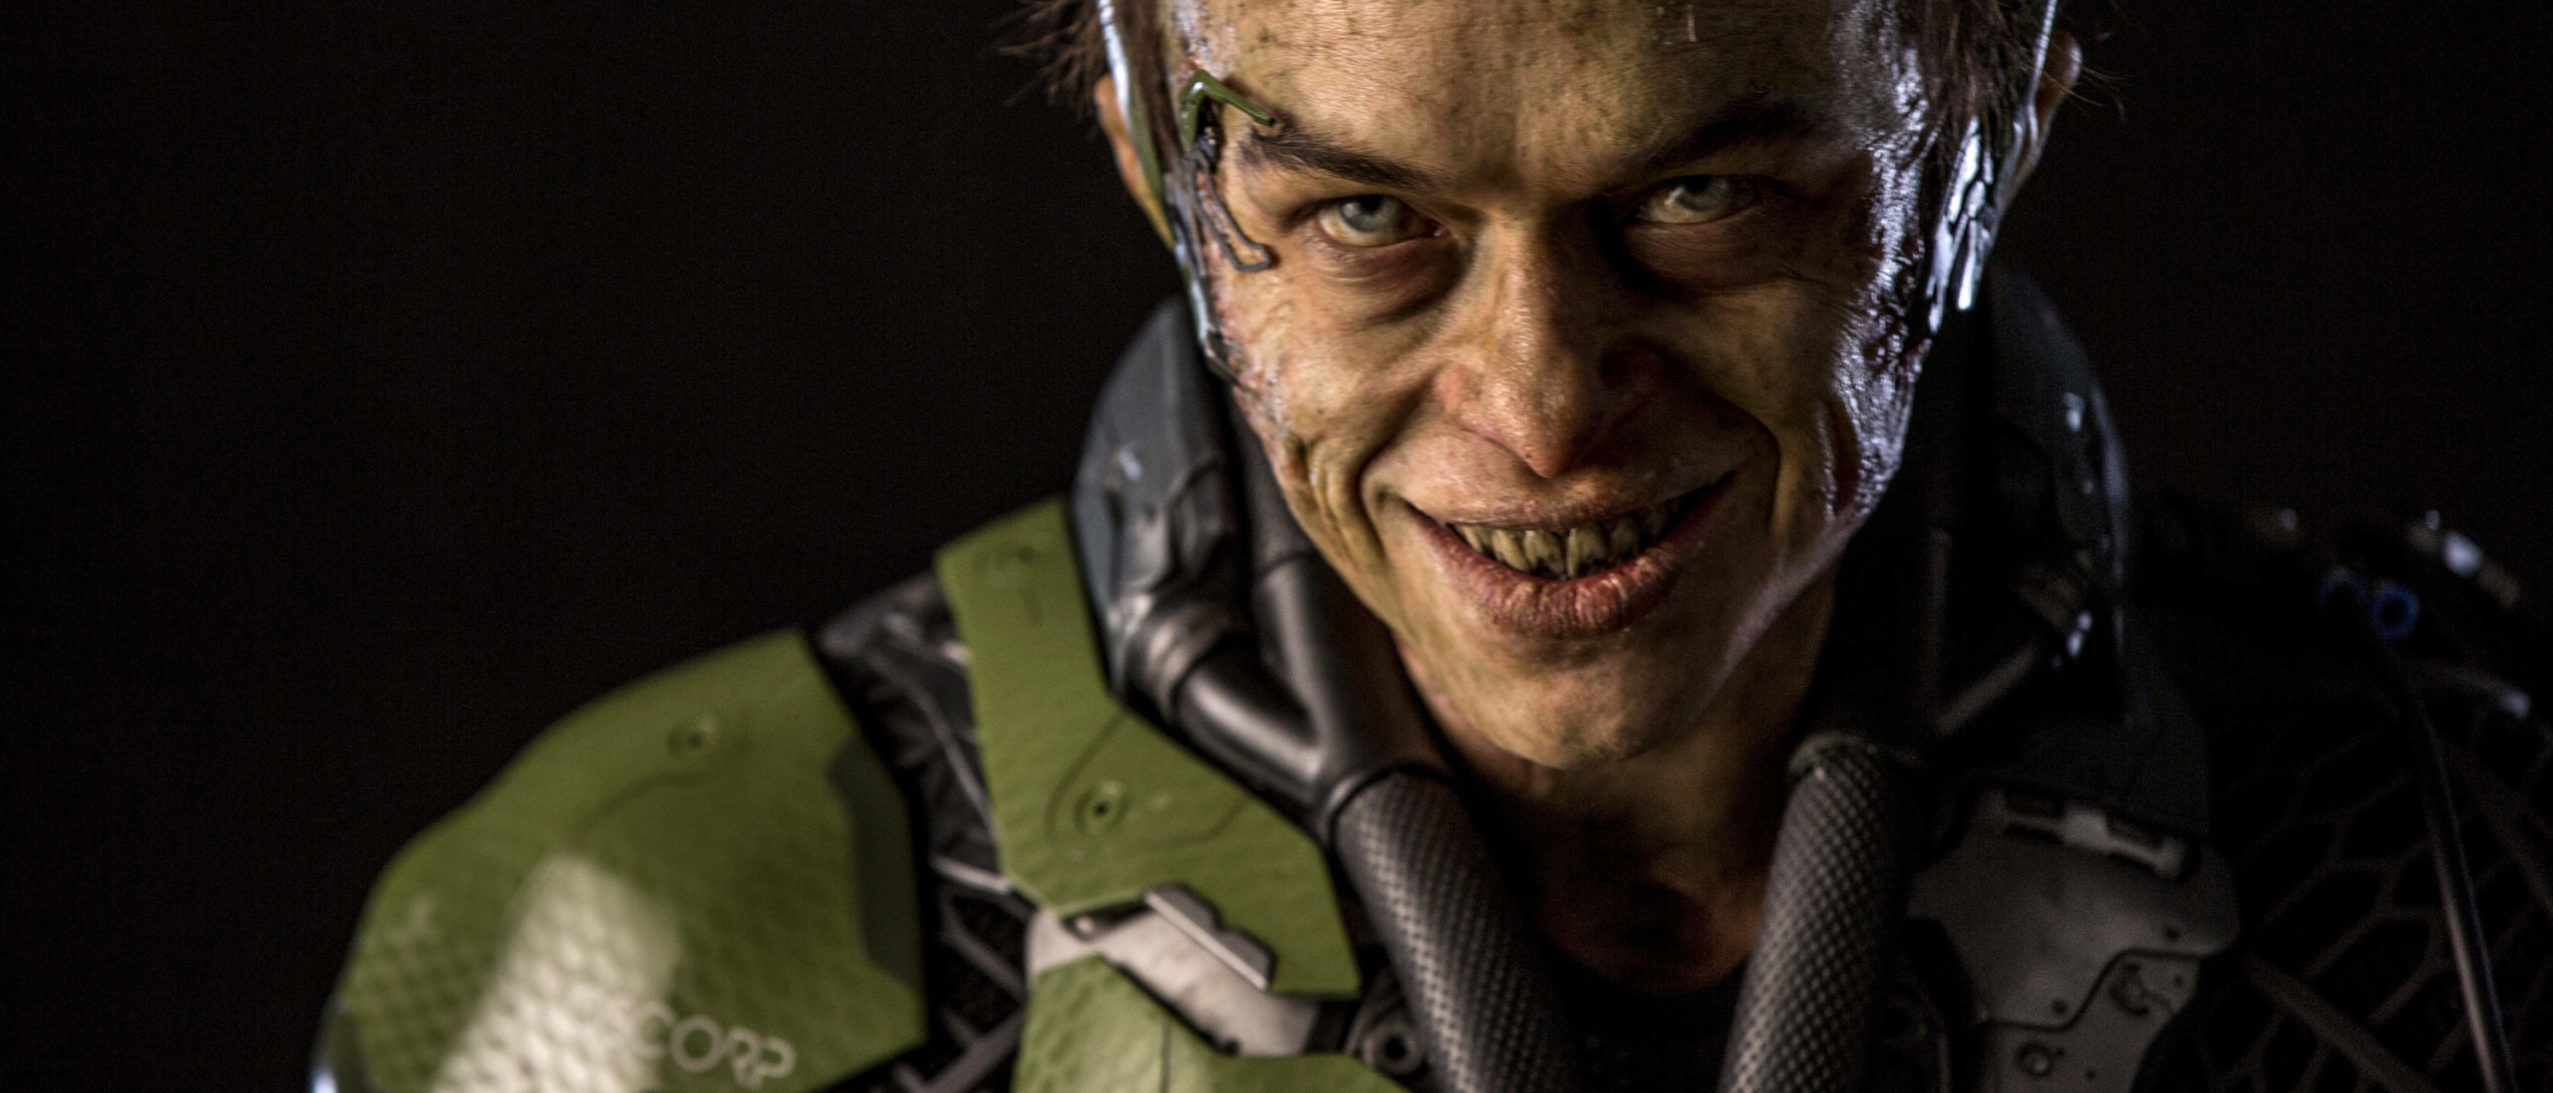 the-amazing-spider-man-2 Dane DeHaan Green Goblin